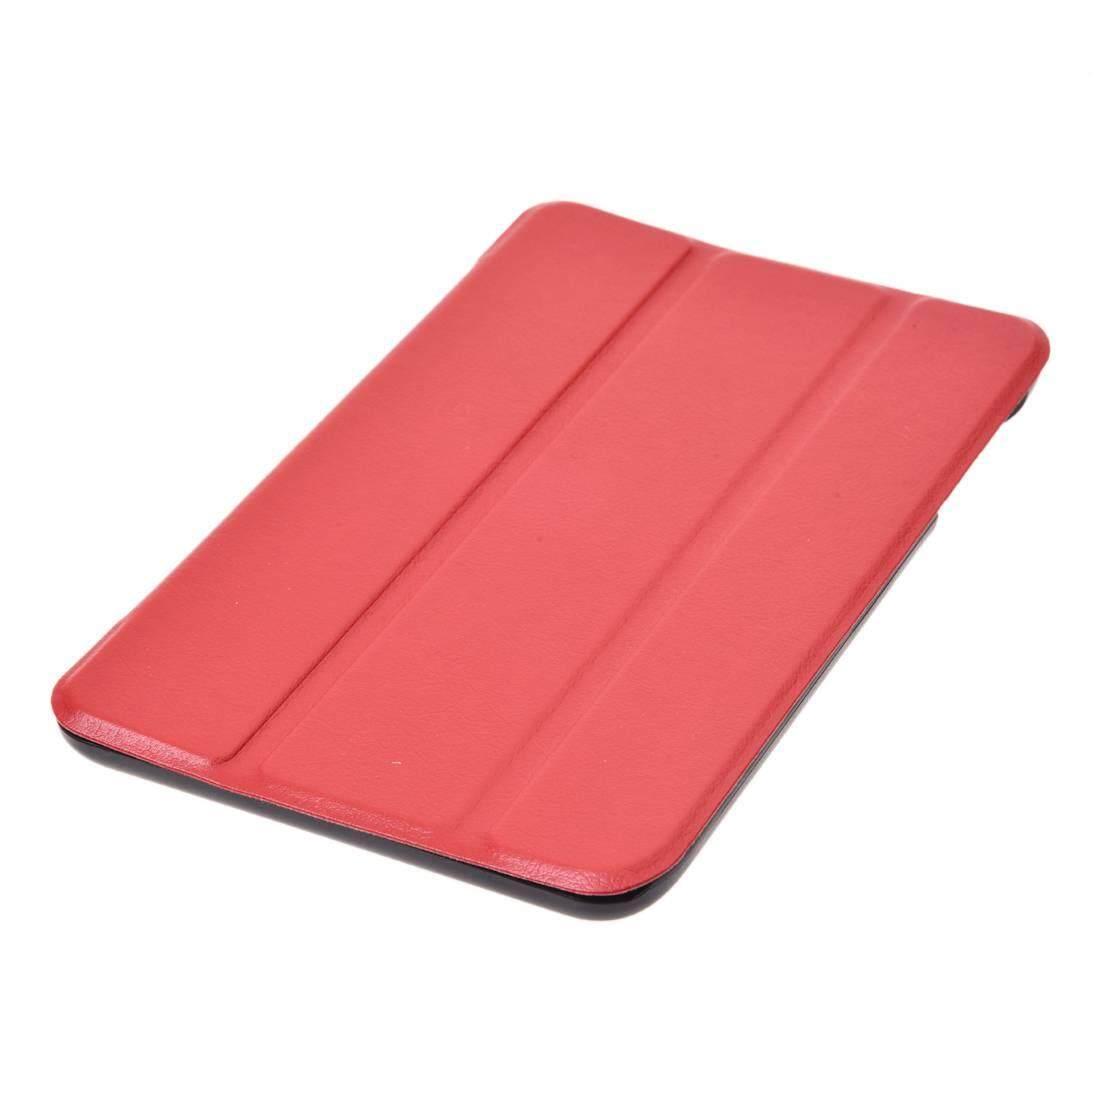 Sarung Tipis Cerdas Tas UNTUK Acer Iconia Satu B1-770 Tablet 7 Inci (Merah)-Intl